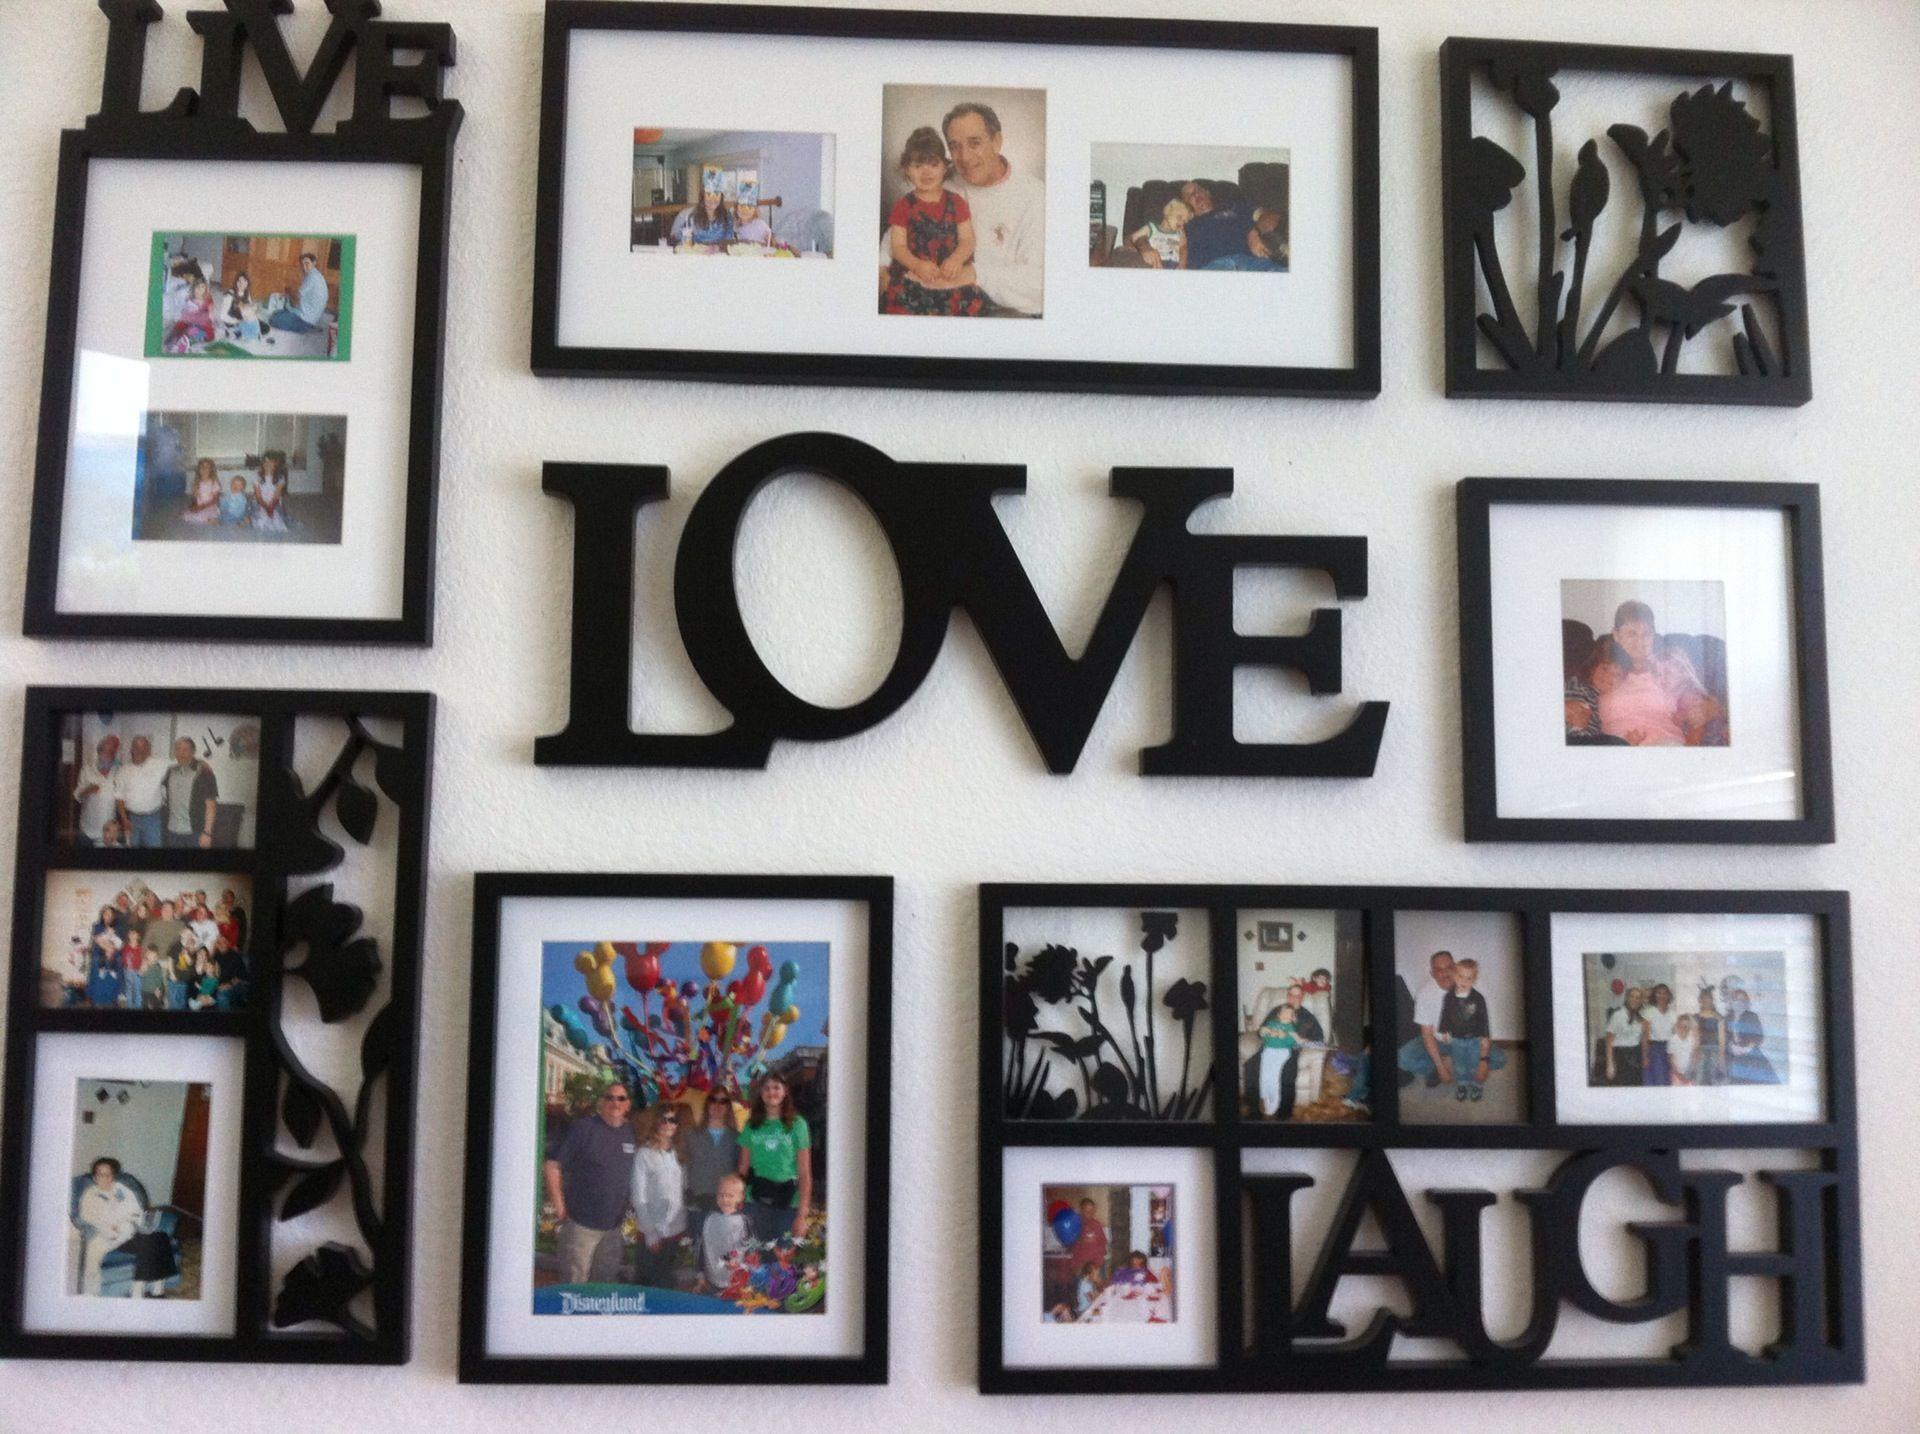 Live Laugh Love Photo Frames Home Wall Frame Set